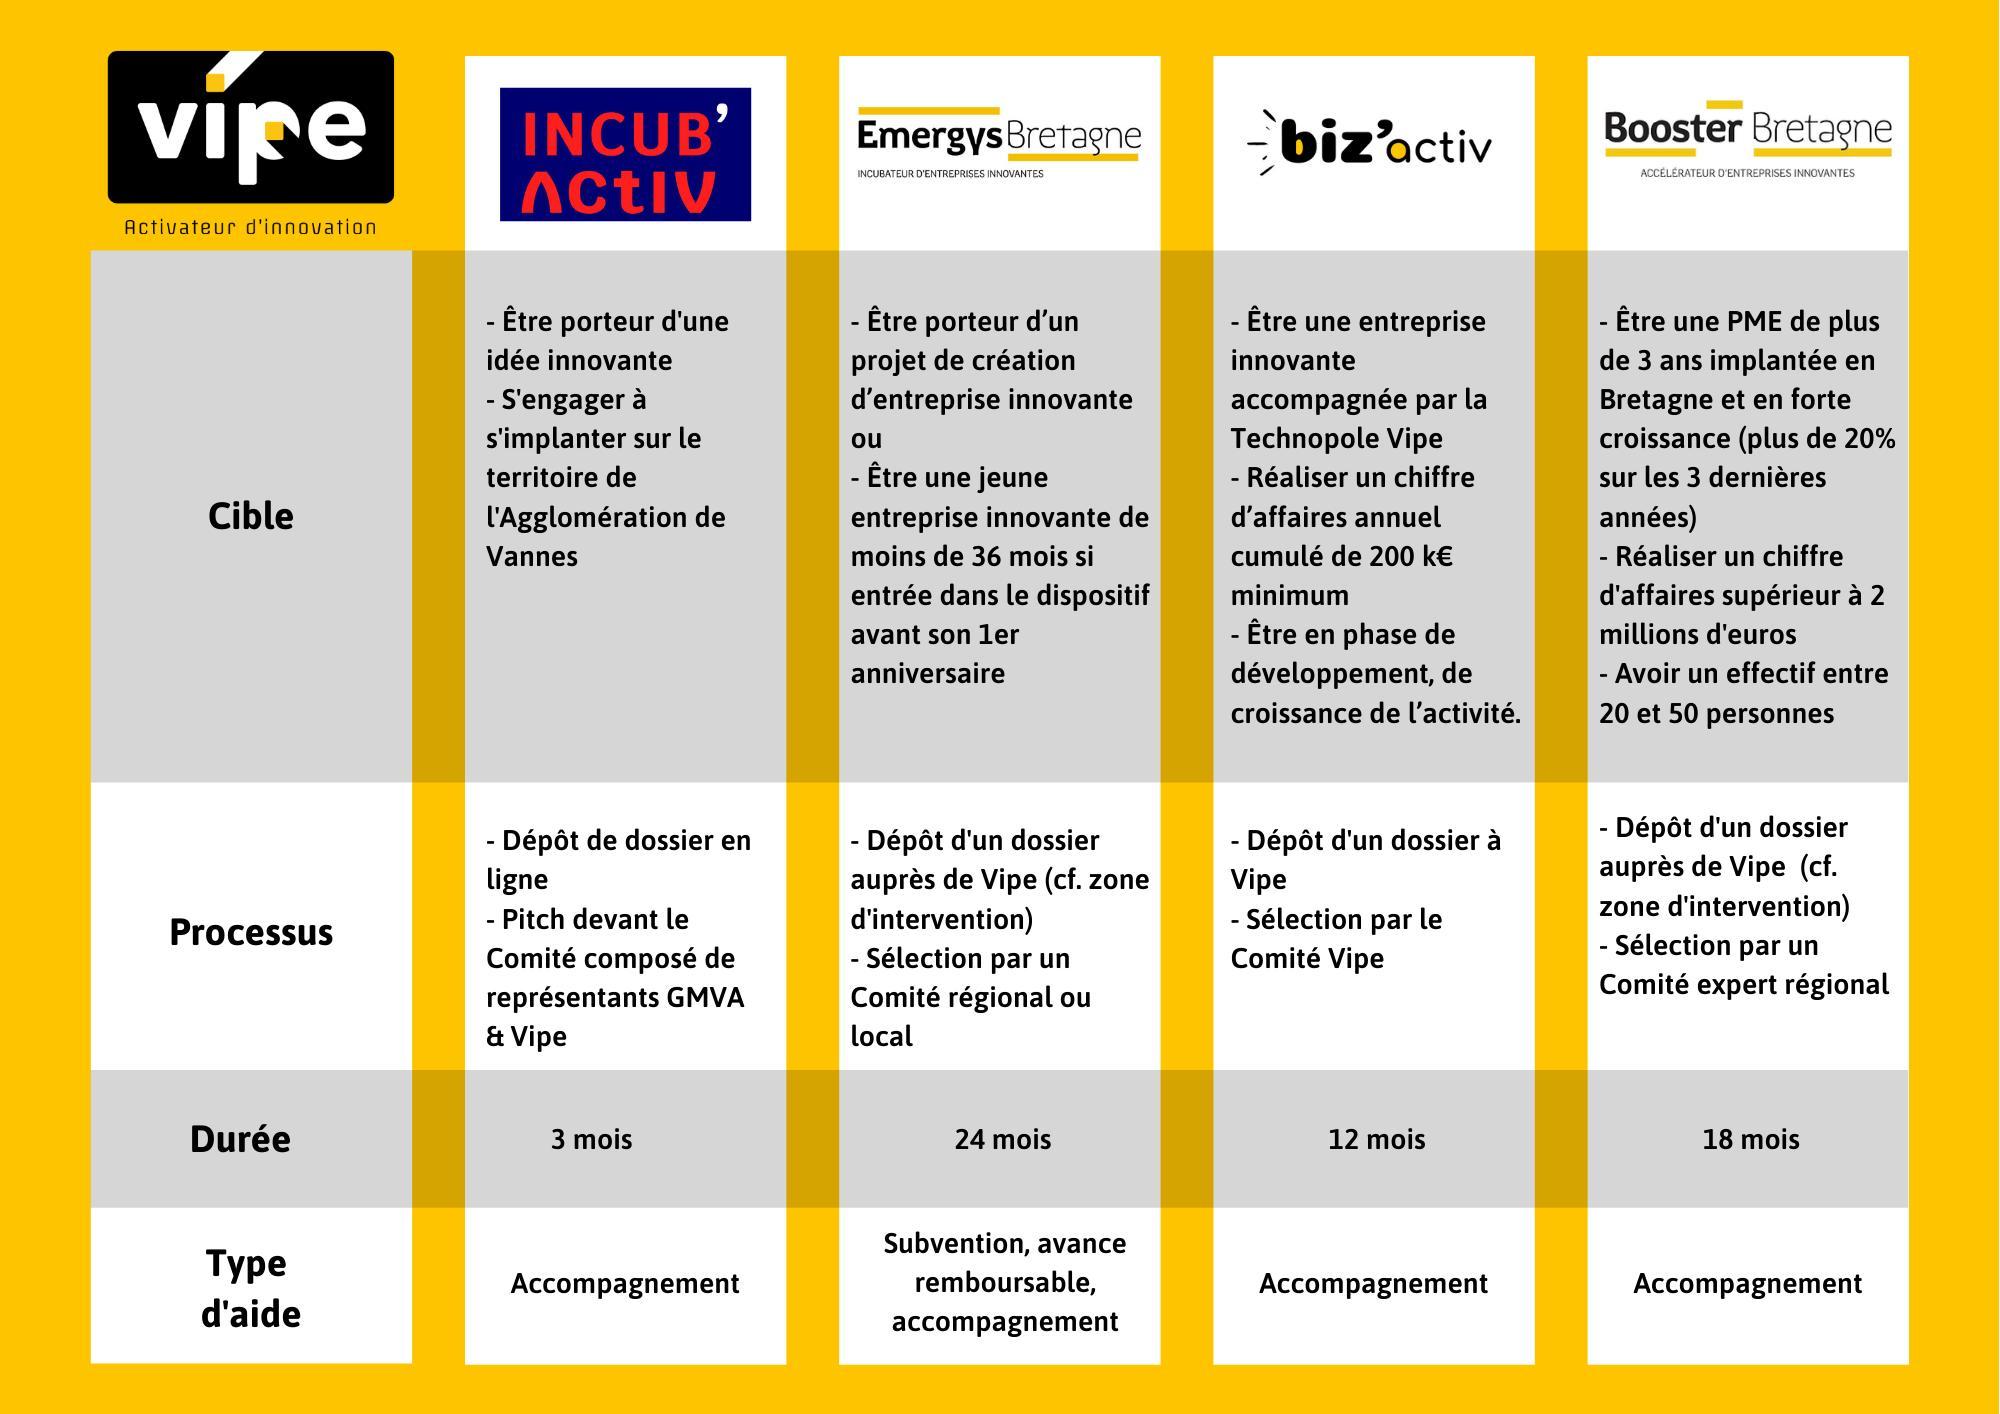 Comparatif Incubateurs Accelerateurs Incubactiv Emergys Bizactiv Booster Bretagne